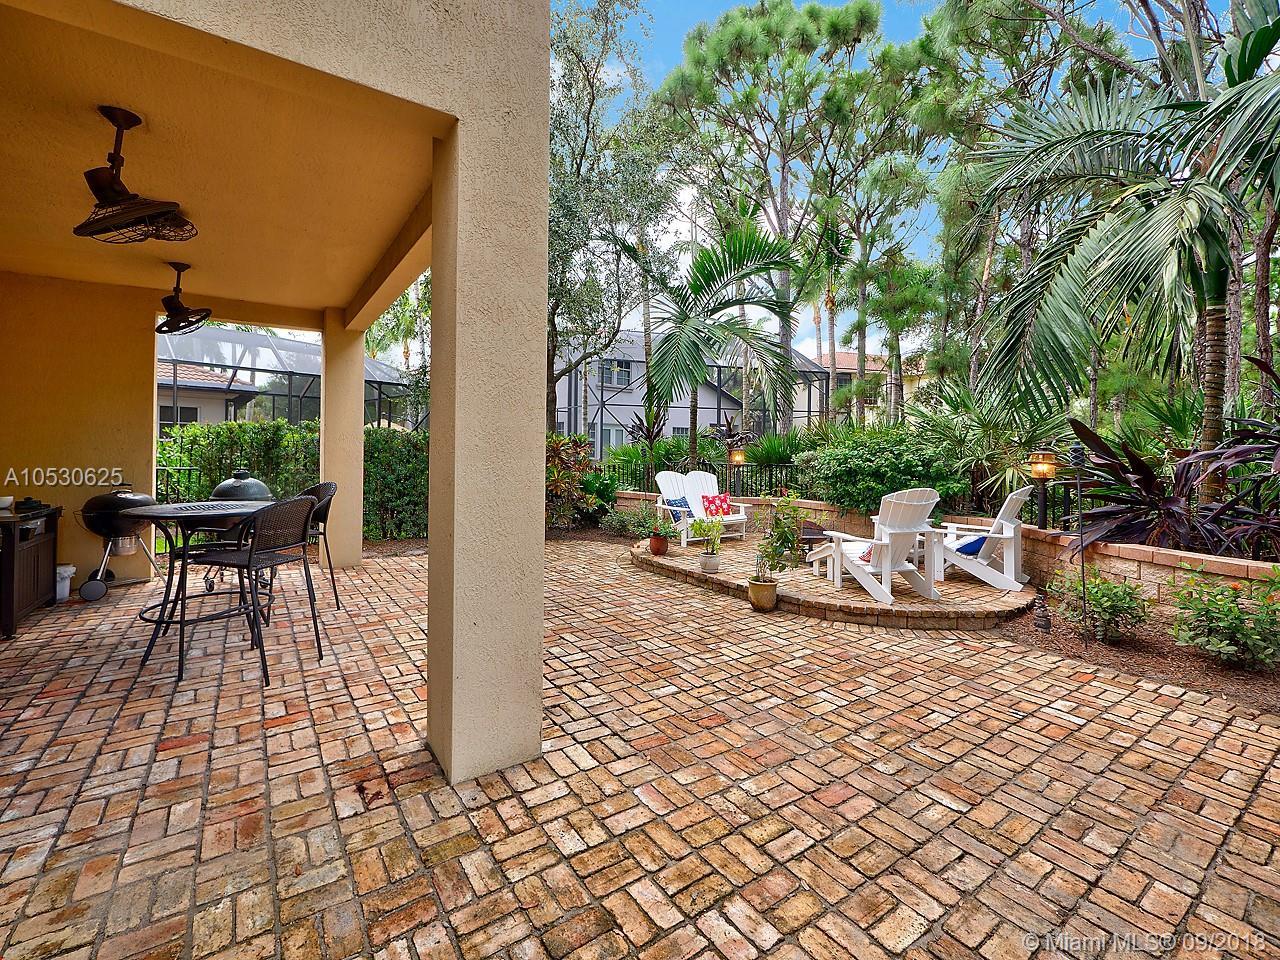 2011 Graden Dr, Palm Beach Gardens FL, 33410